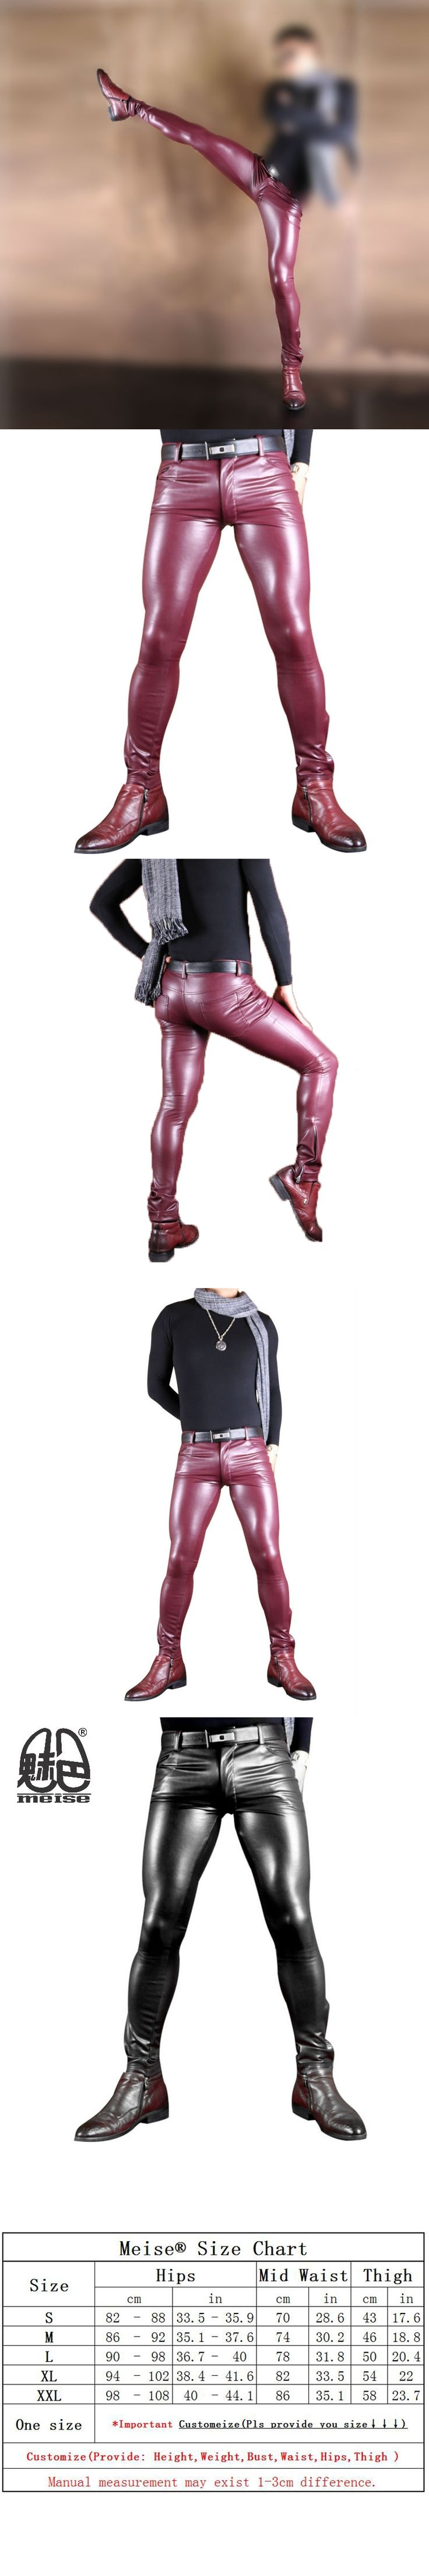 2017 New Plus Size Faux Leather Pants Men Black and Red Elastic Shiny Clubwear Skinny Pants Gay Club Dancewear